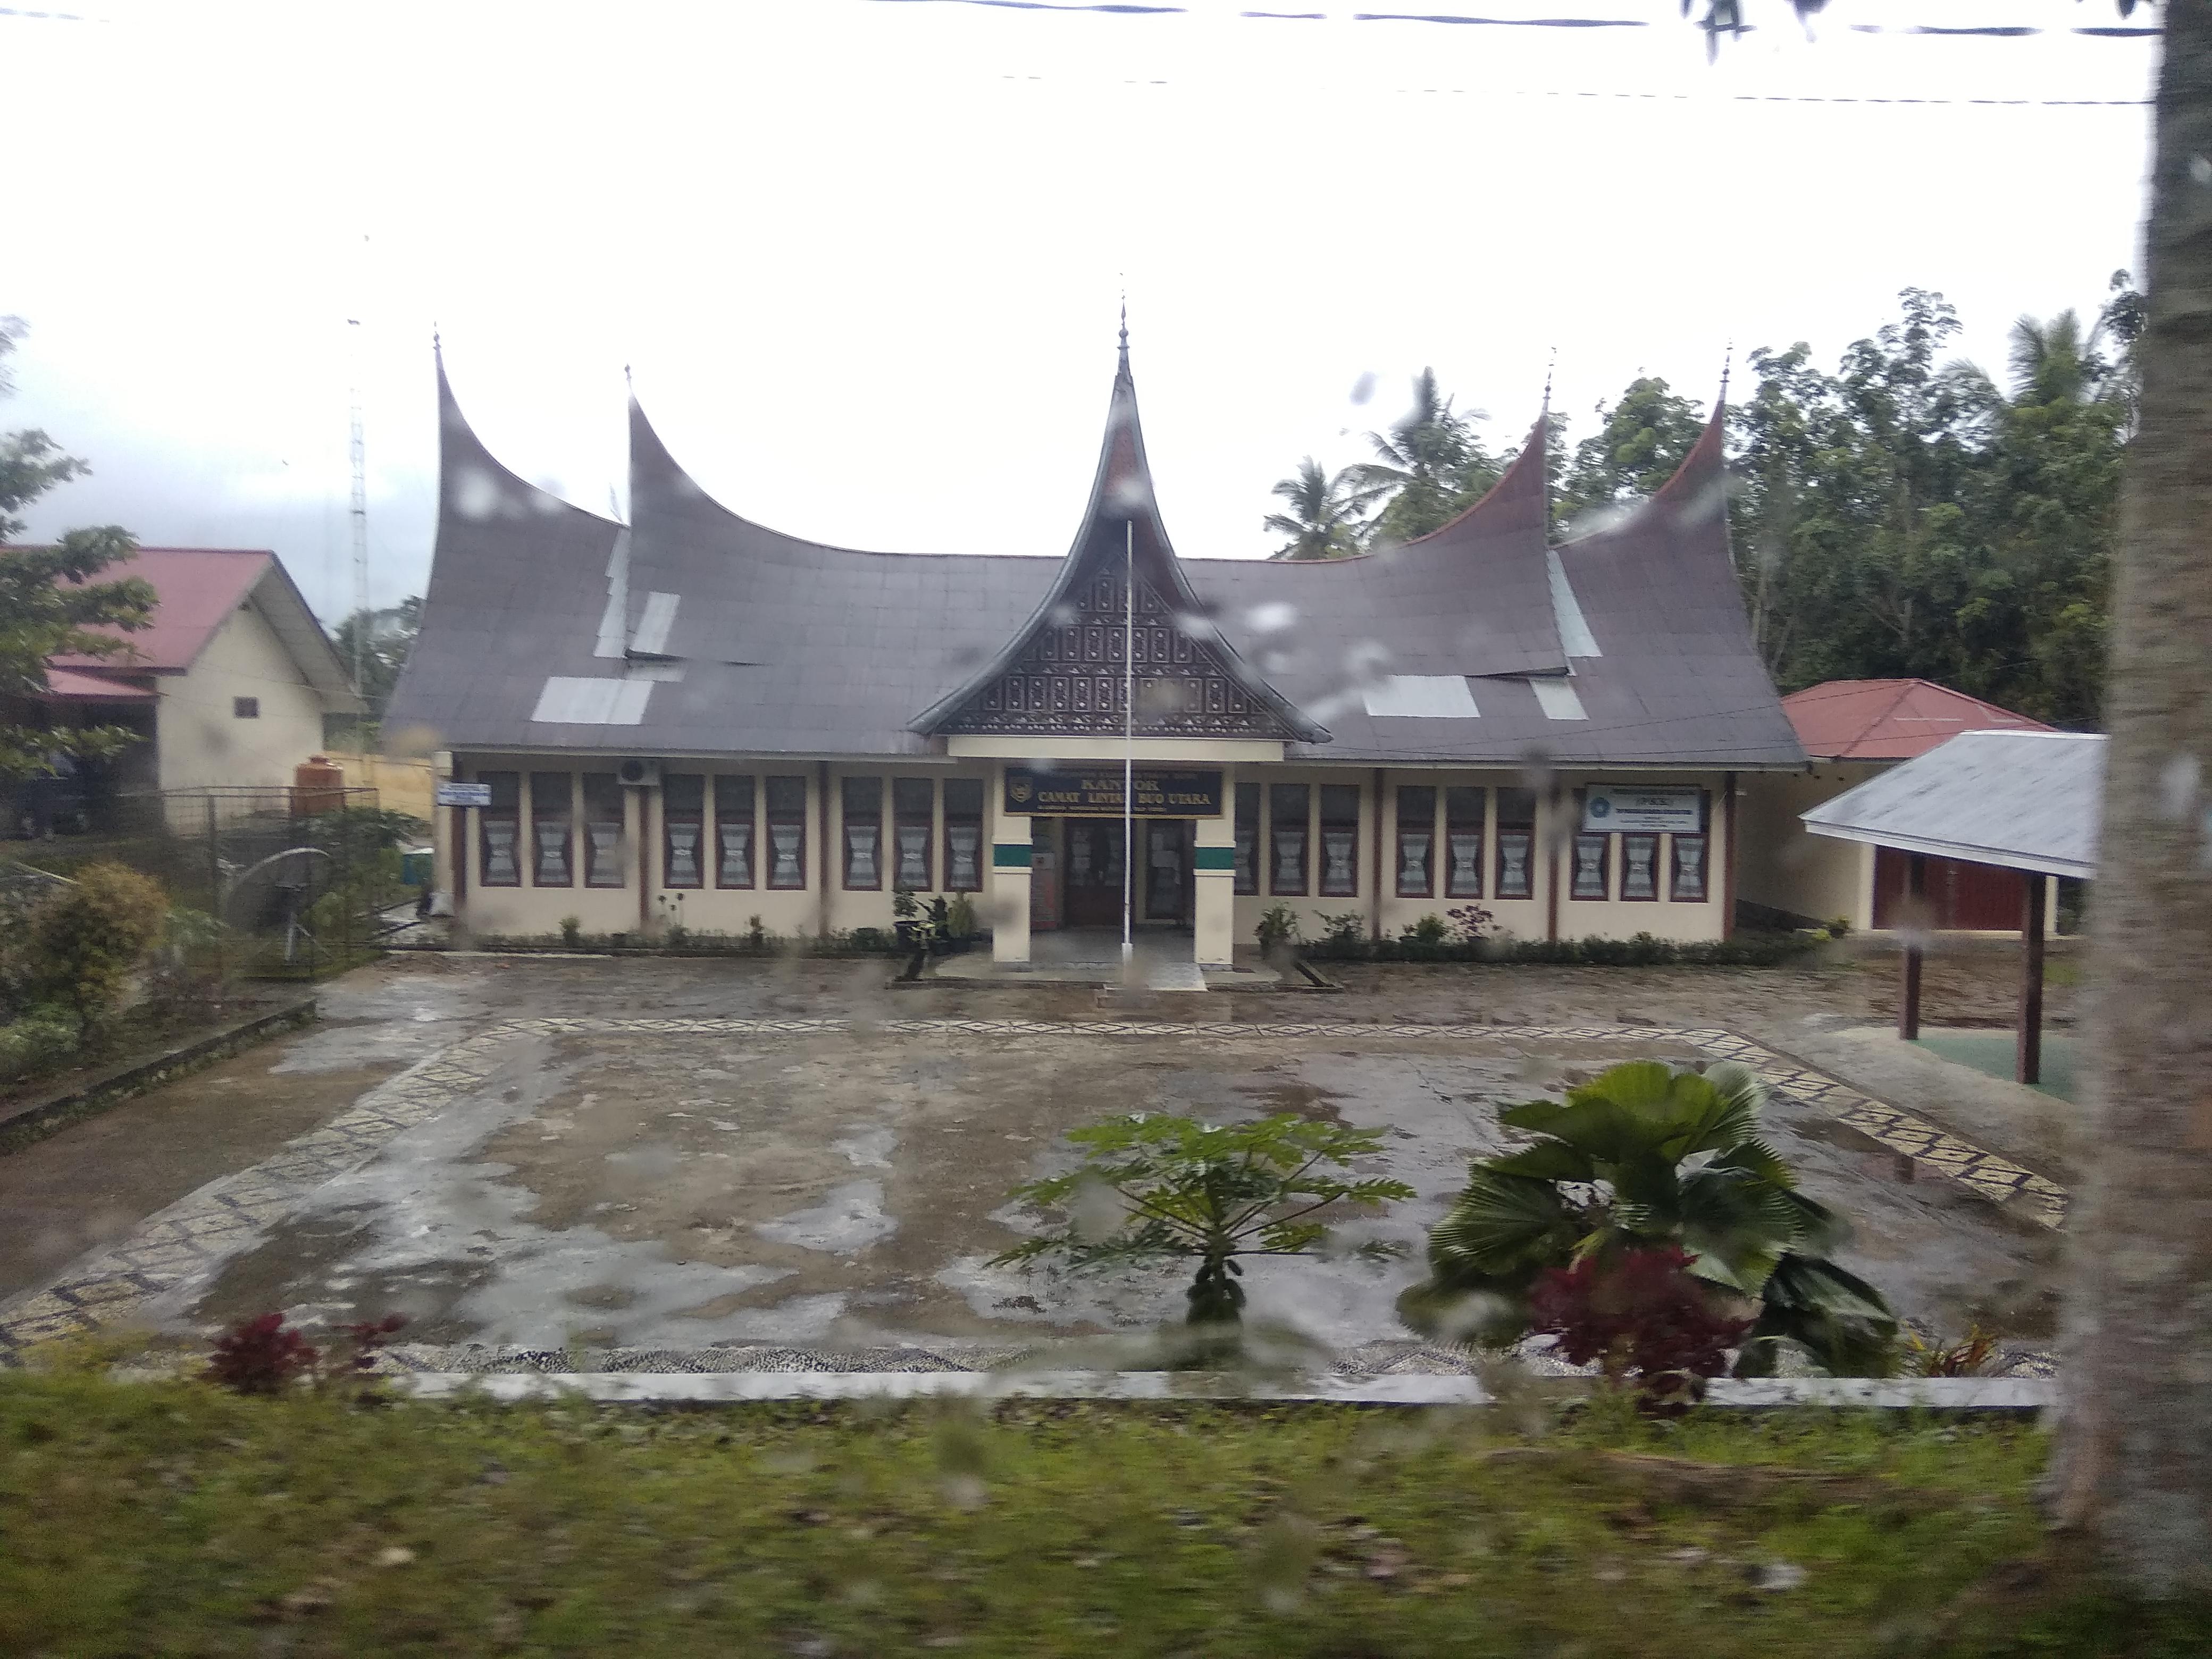 Berkas Kantor Camat Lintau Buo Utara Jpg Wikipedia Bahasa Indonesia Ensiklopedia Bebas